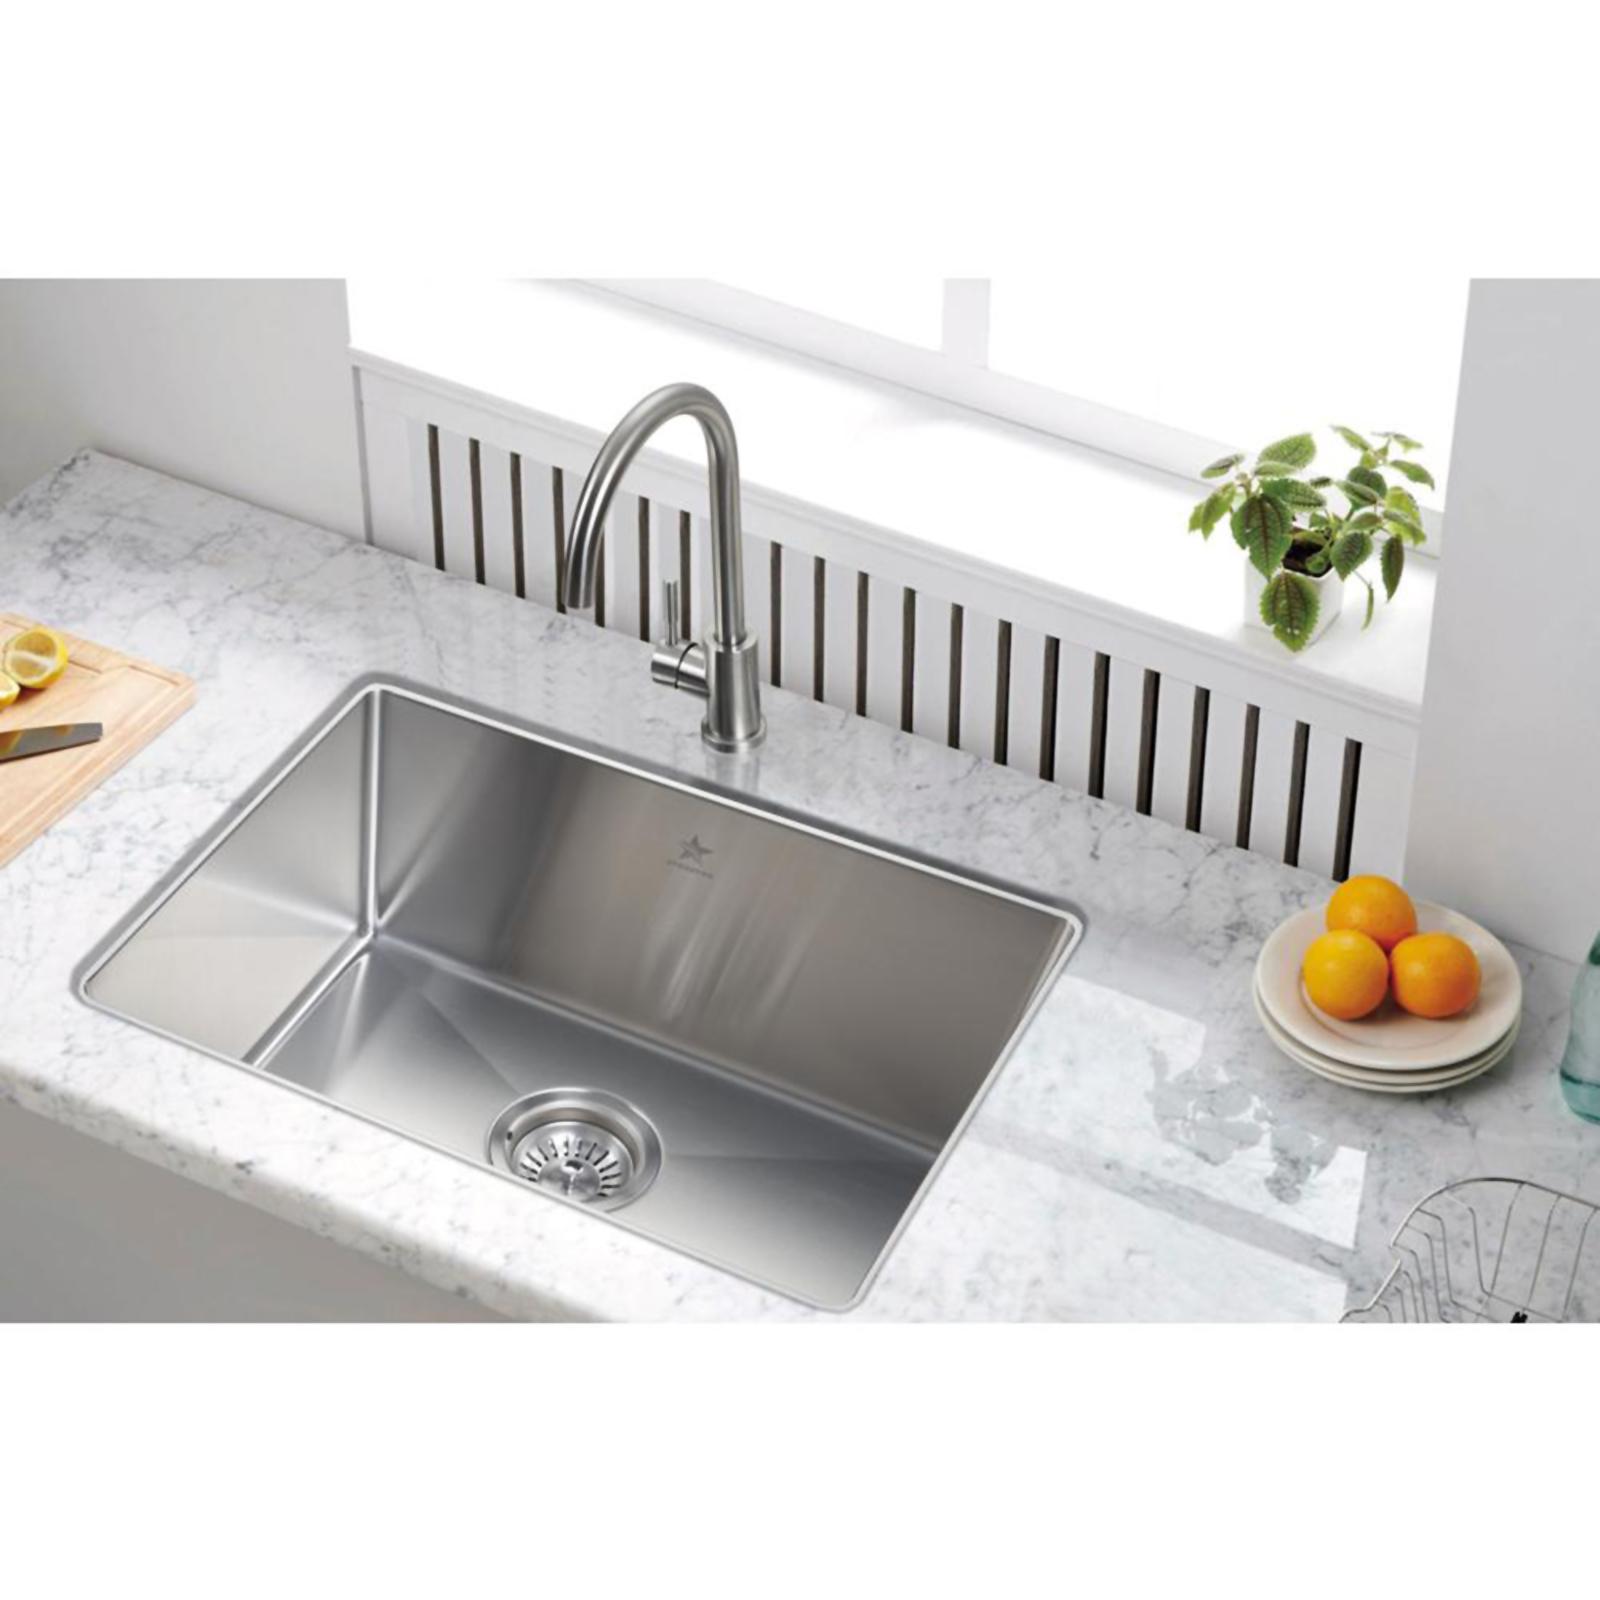 undermount single bowl kitchen sink white knobs for cabinets starstar 21 x 16 sears marketplace